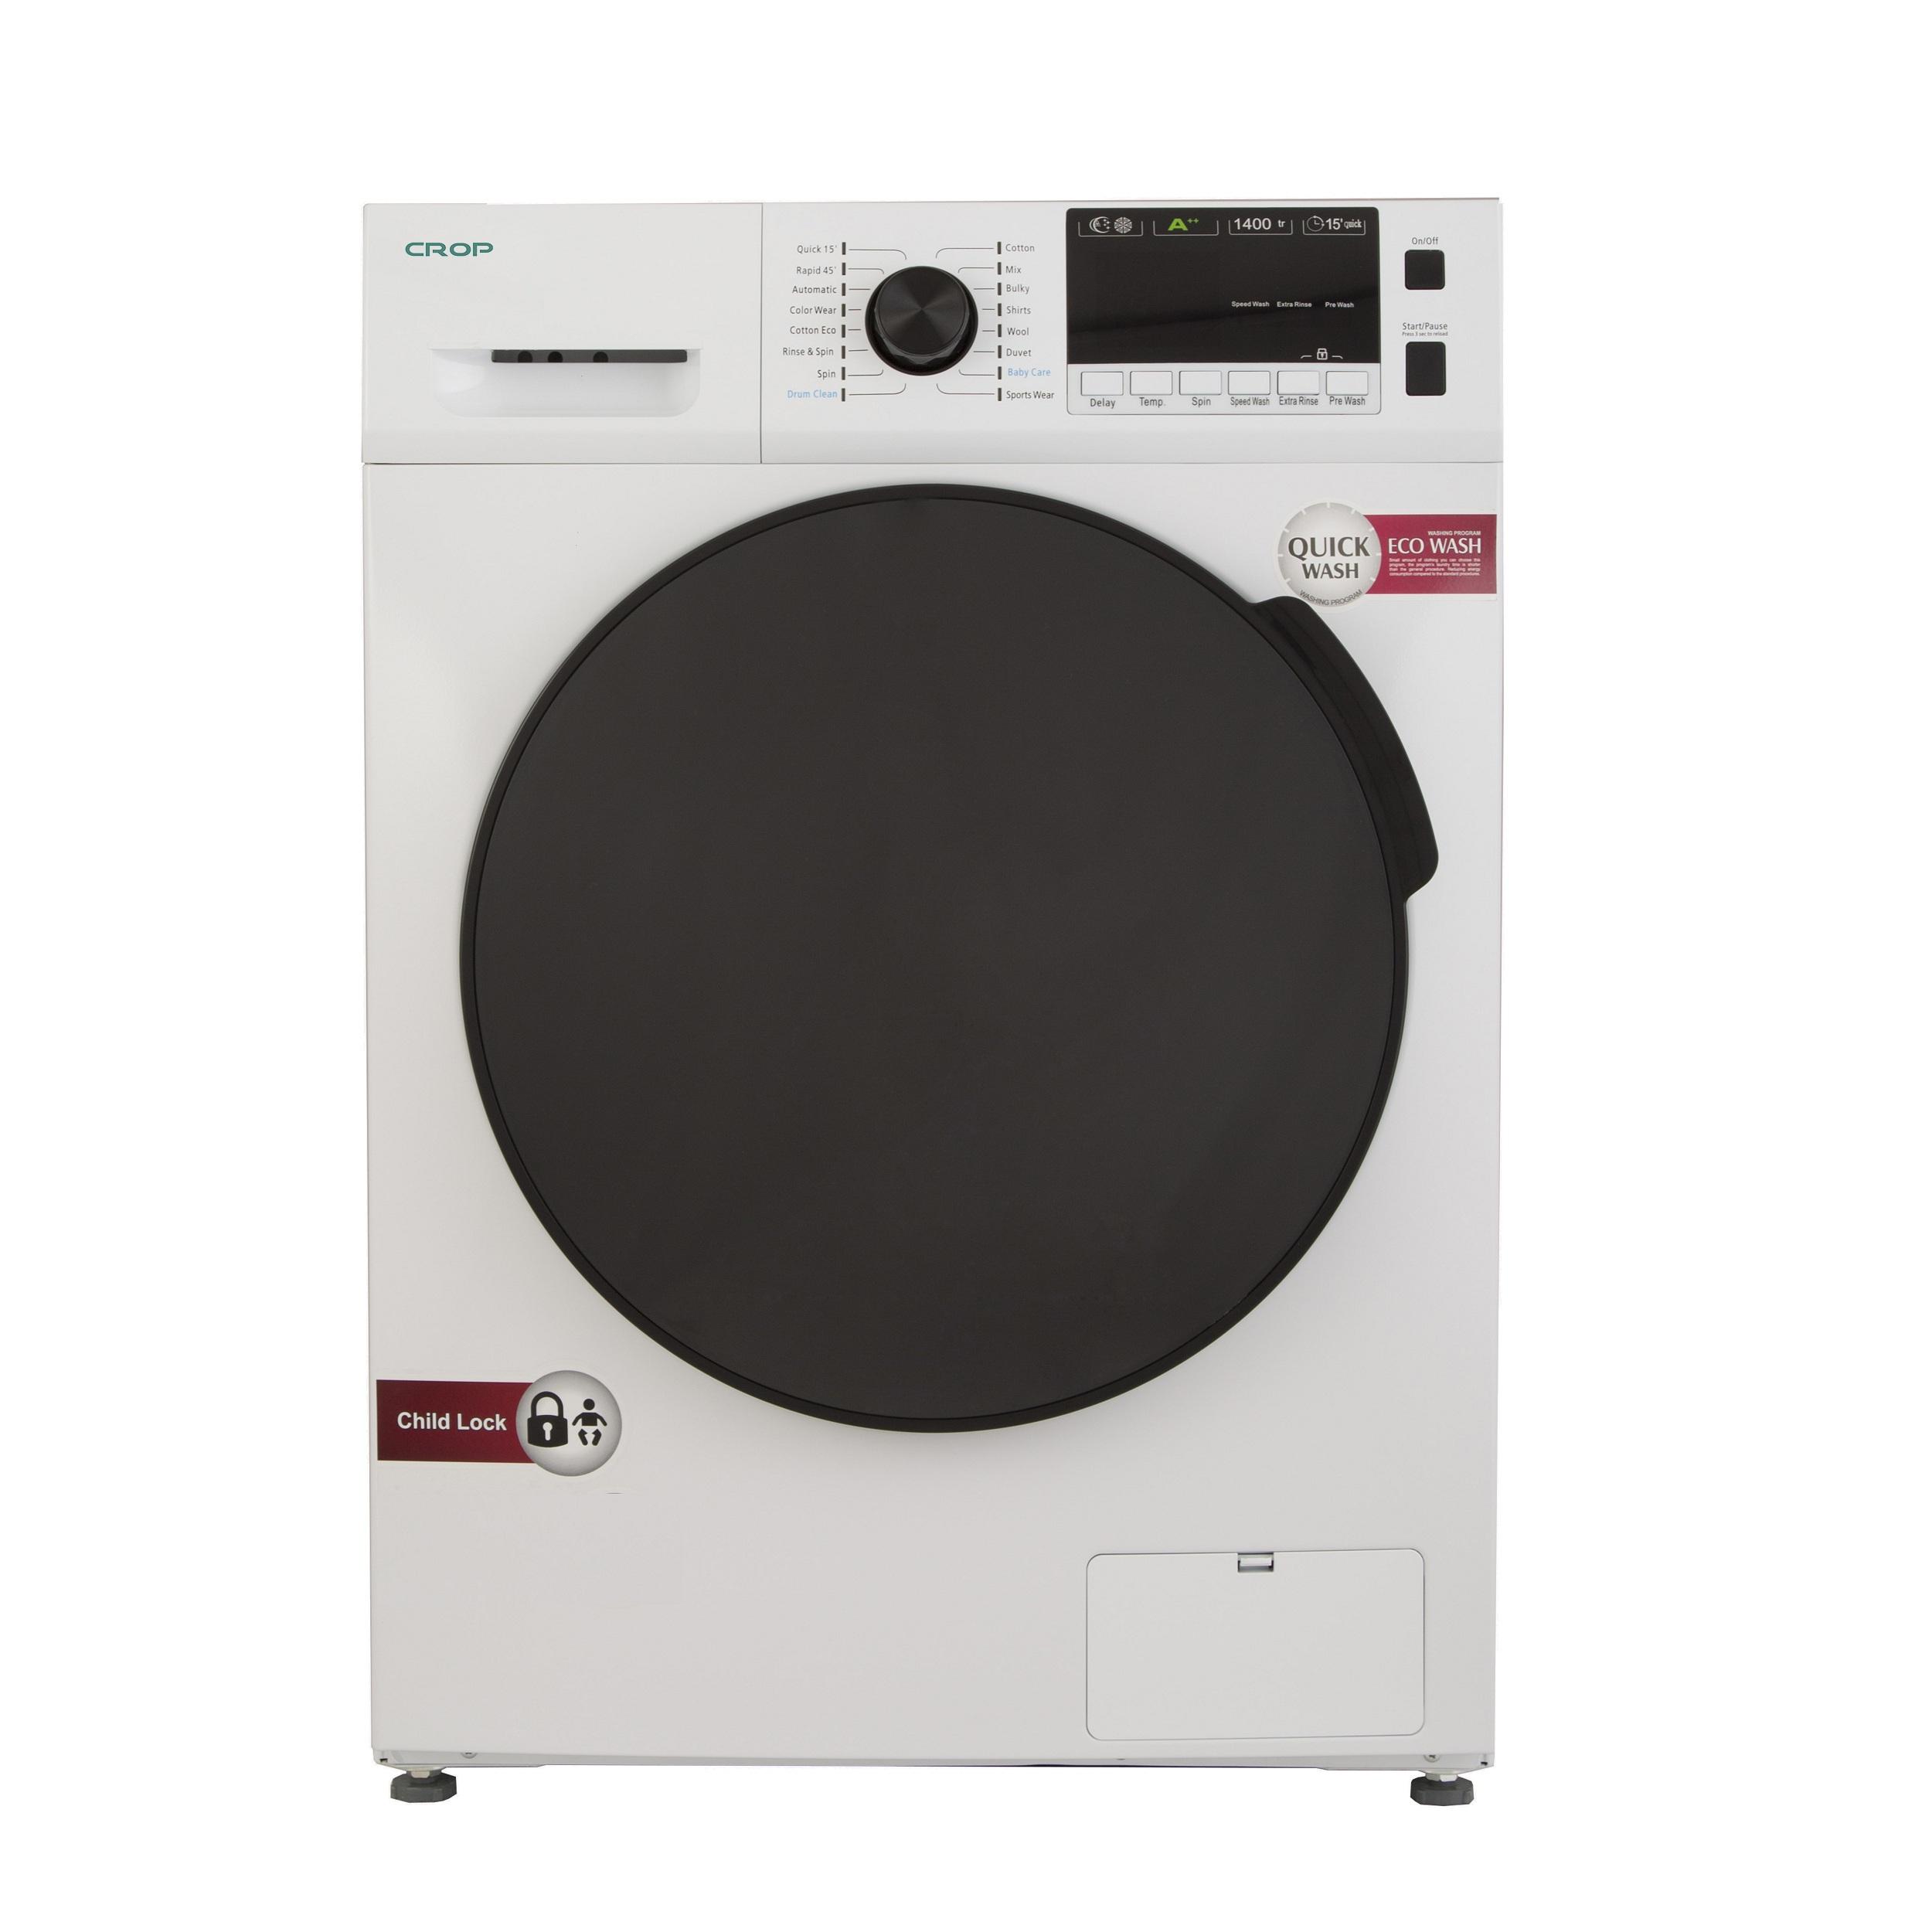 ماشین لباسشویی کروپ مدل WFT-27417 ظرفیت 7 کیلوگرم